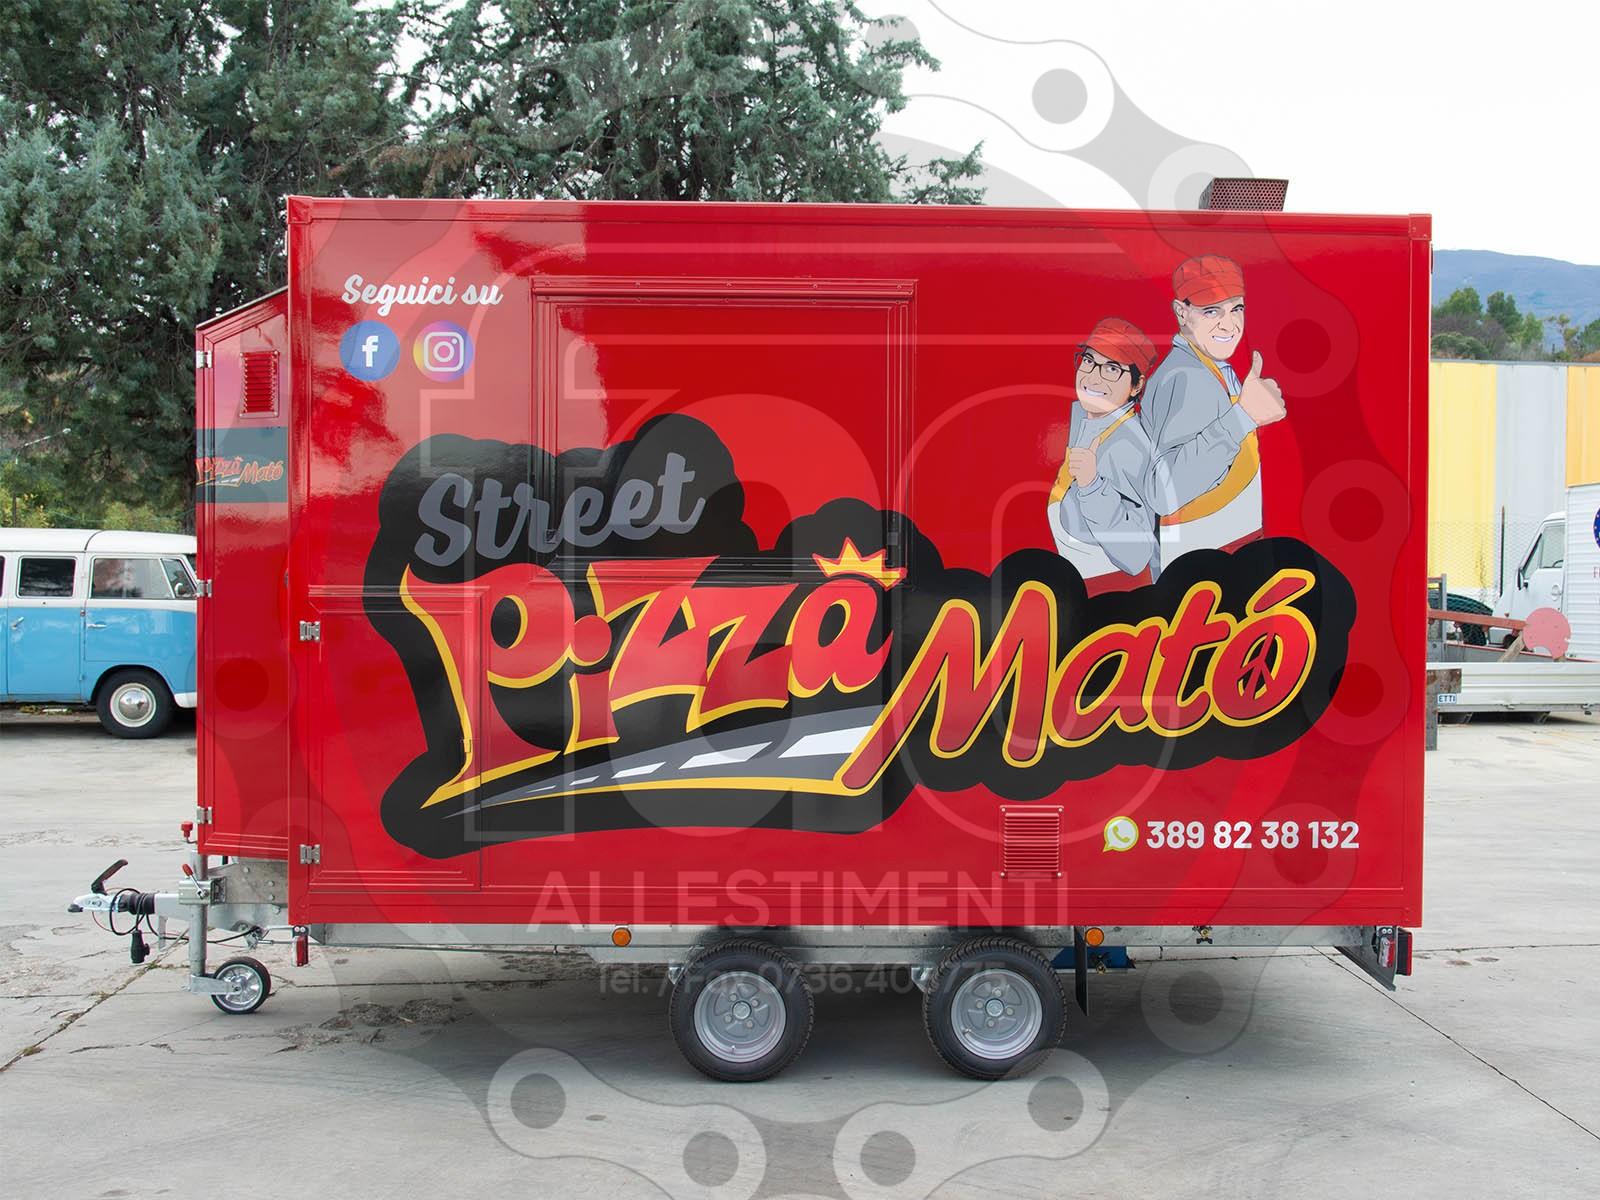 Gallery Street Pizza Matò